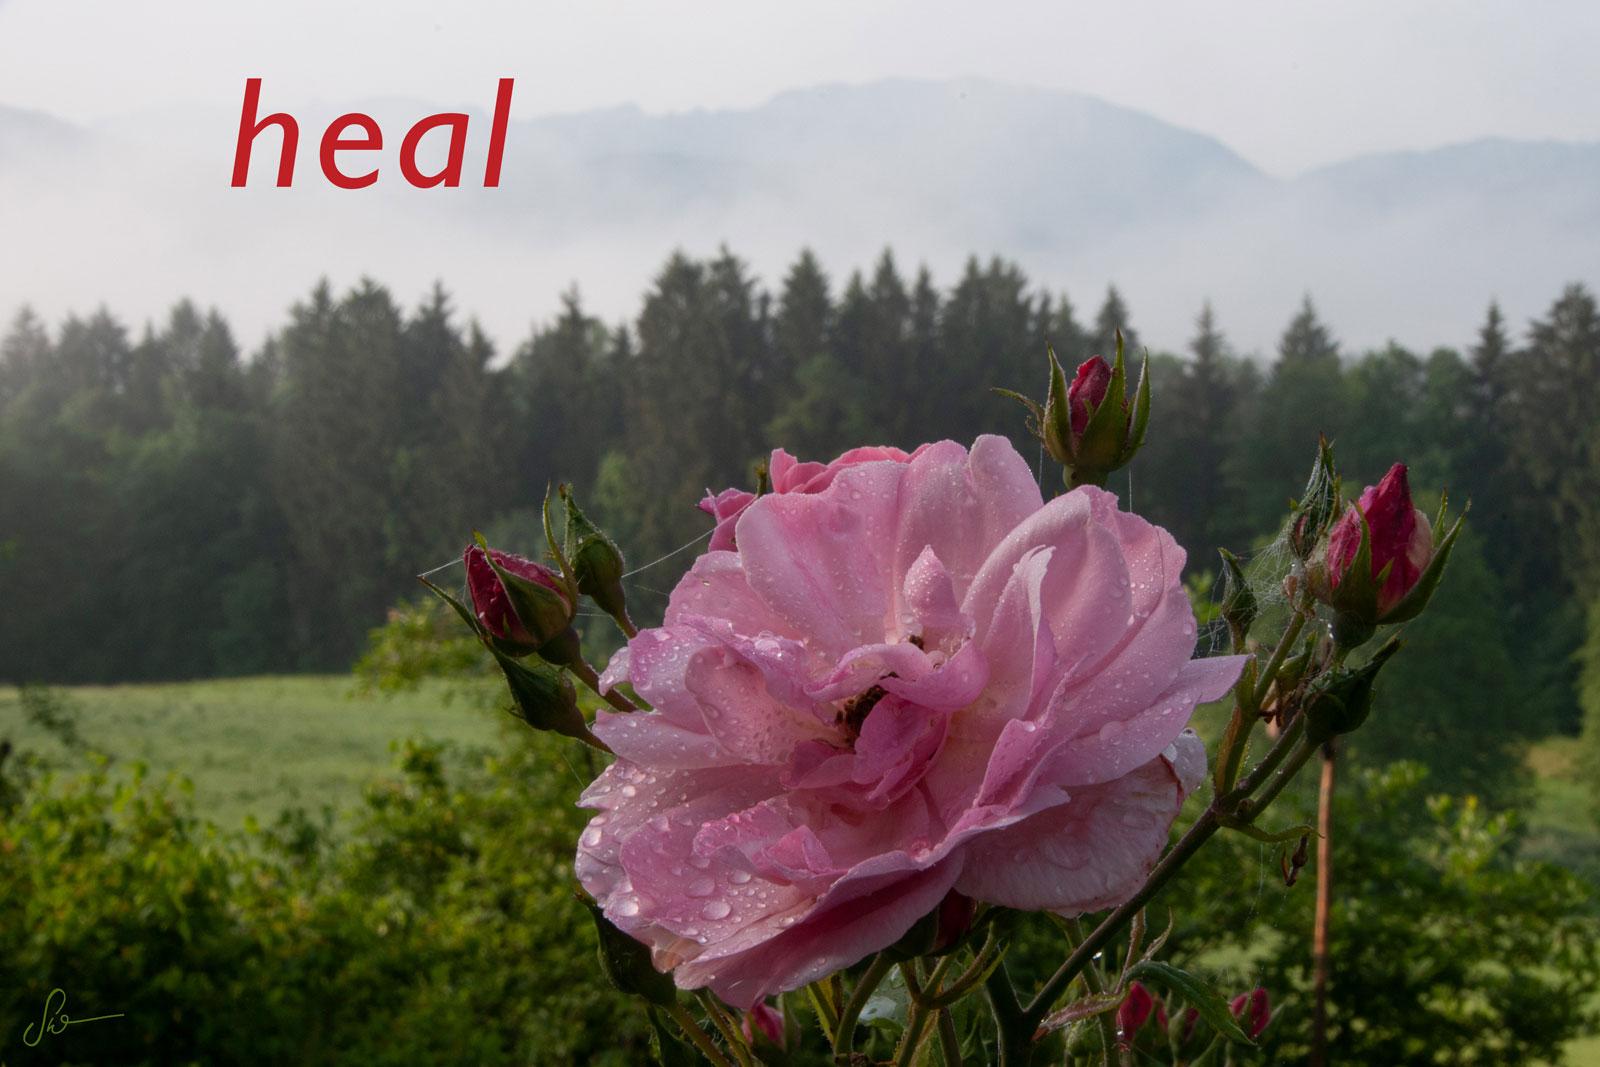 Rose-Nantes_3710-14B_sw_heal-v2